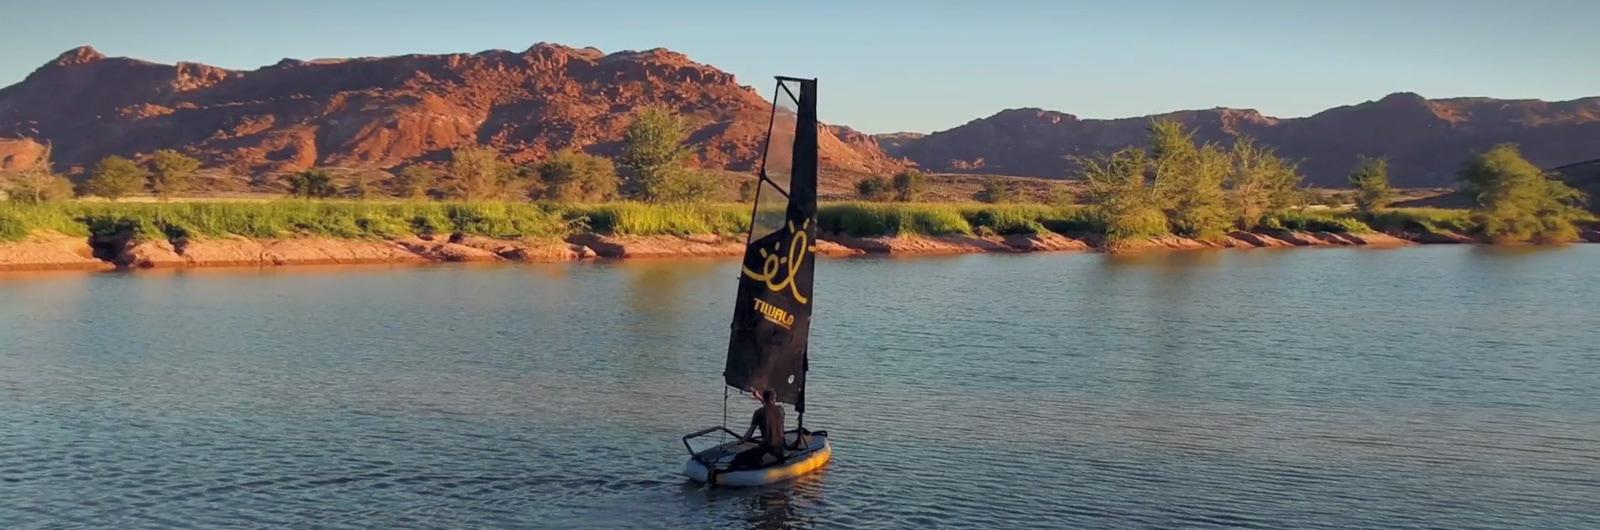 Tiwal 3 sailing dinghy in Namibia